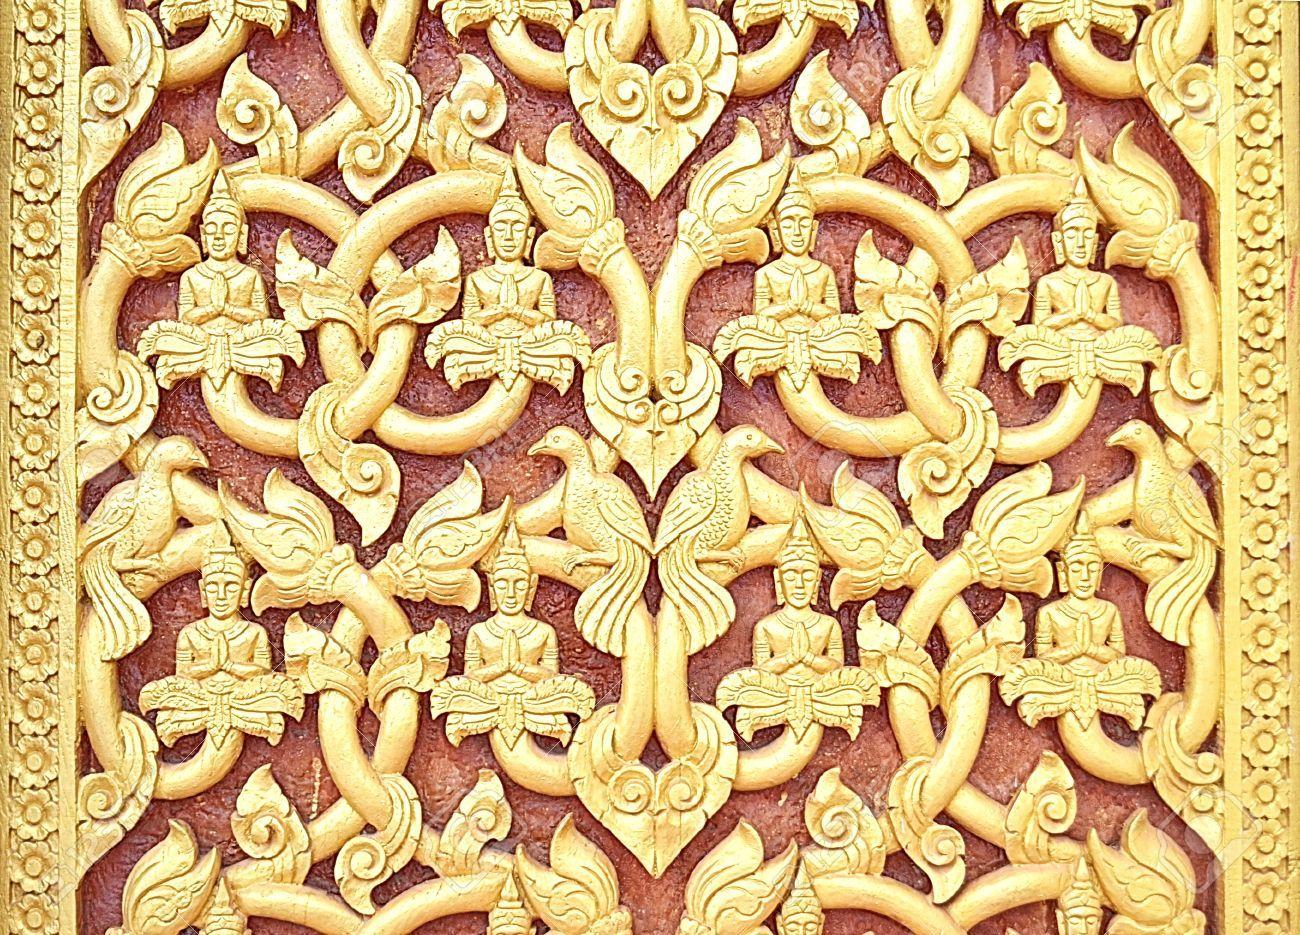 22032497-Pattern-of-Laos-Wood-carving-art--Stock-Photo.jpg (1300×935 ...